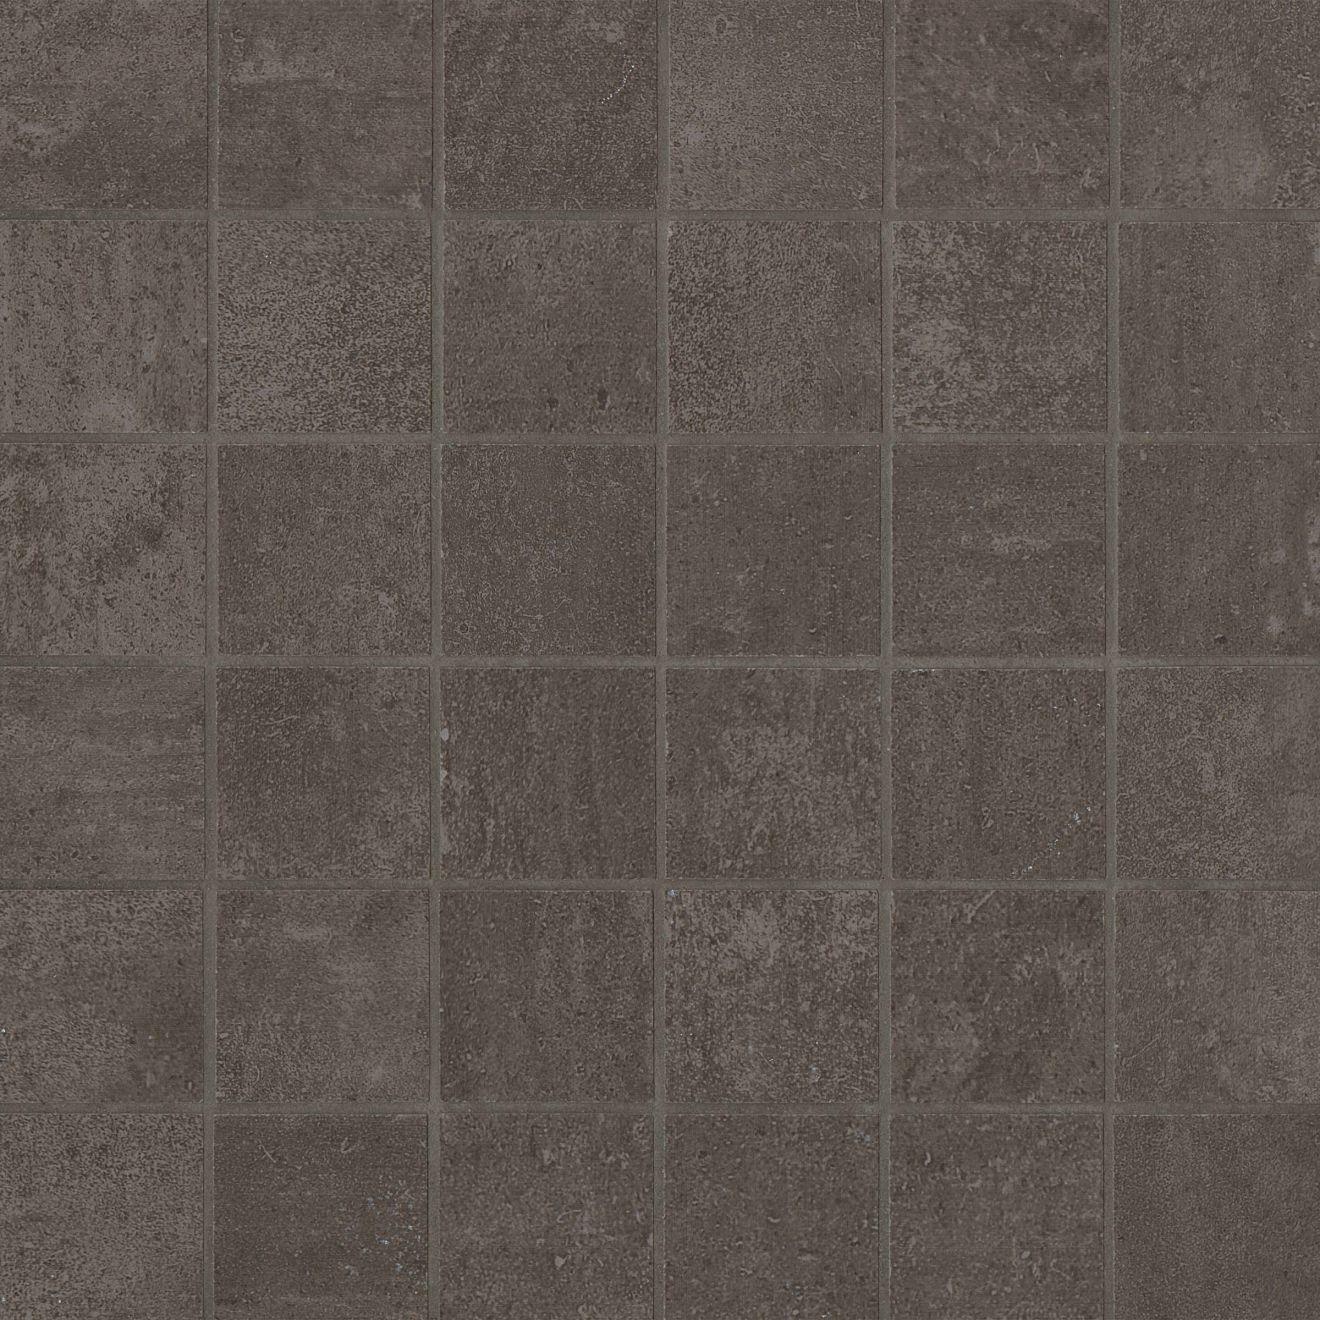 "Simply Modern 2"" x 2"" Floor & Wall Mosaic in Coffee"